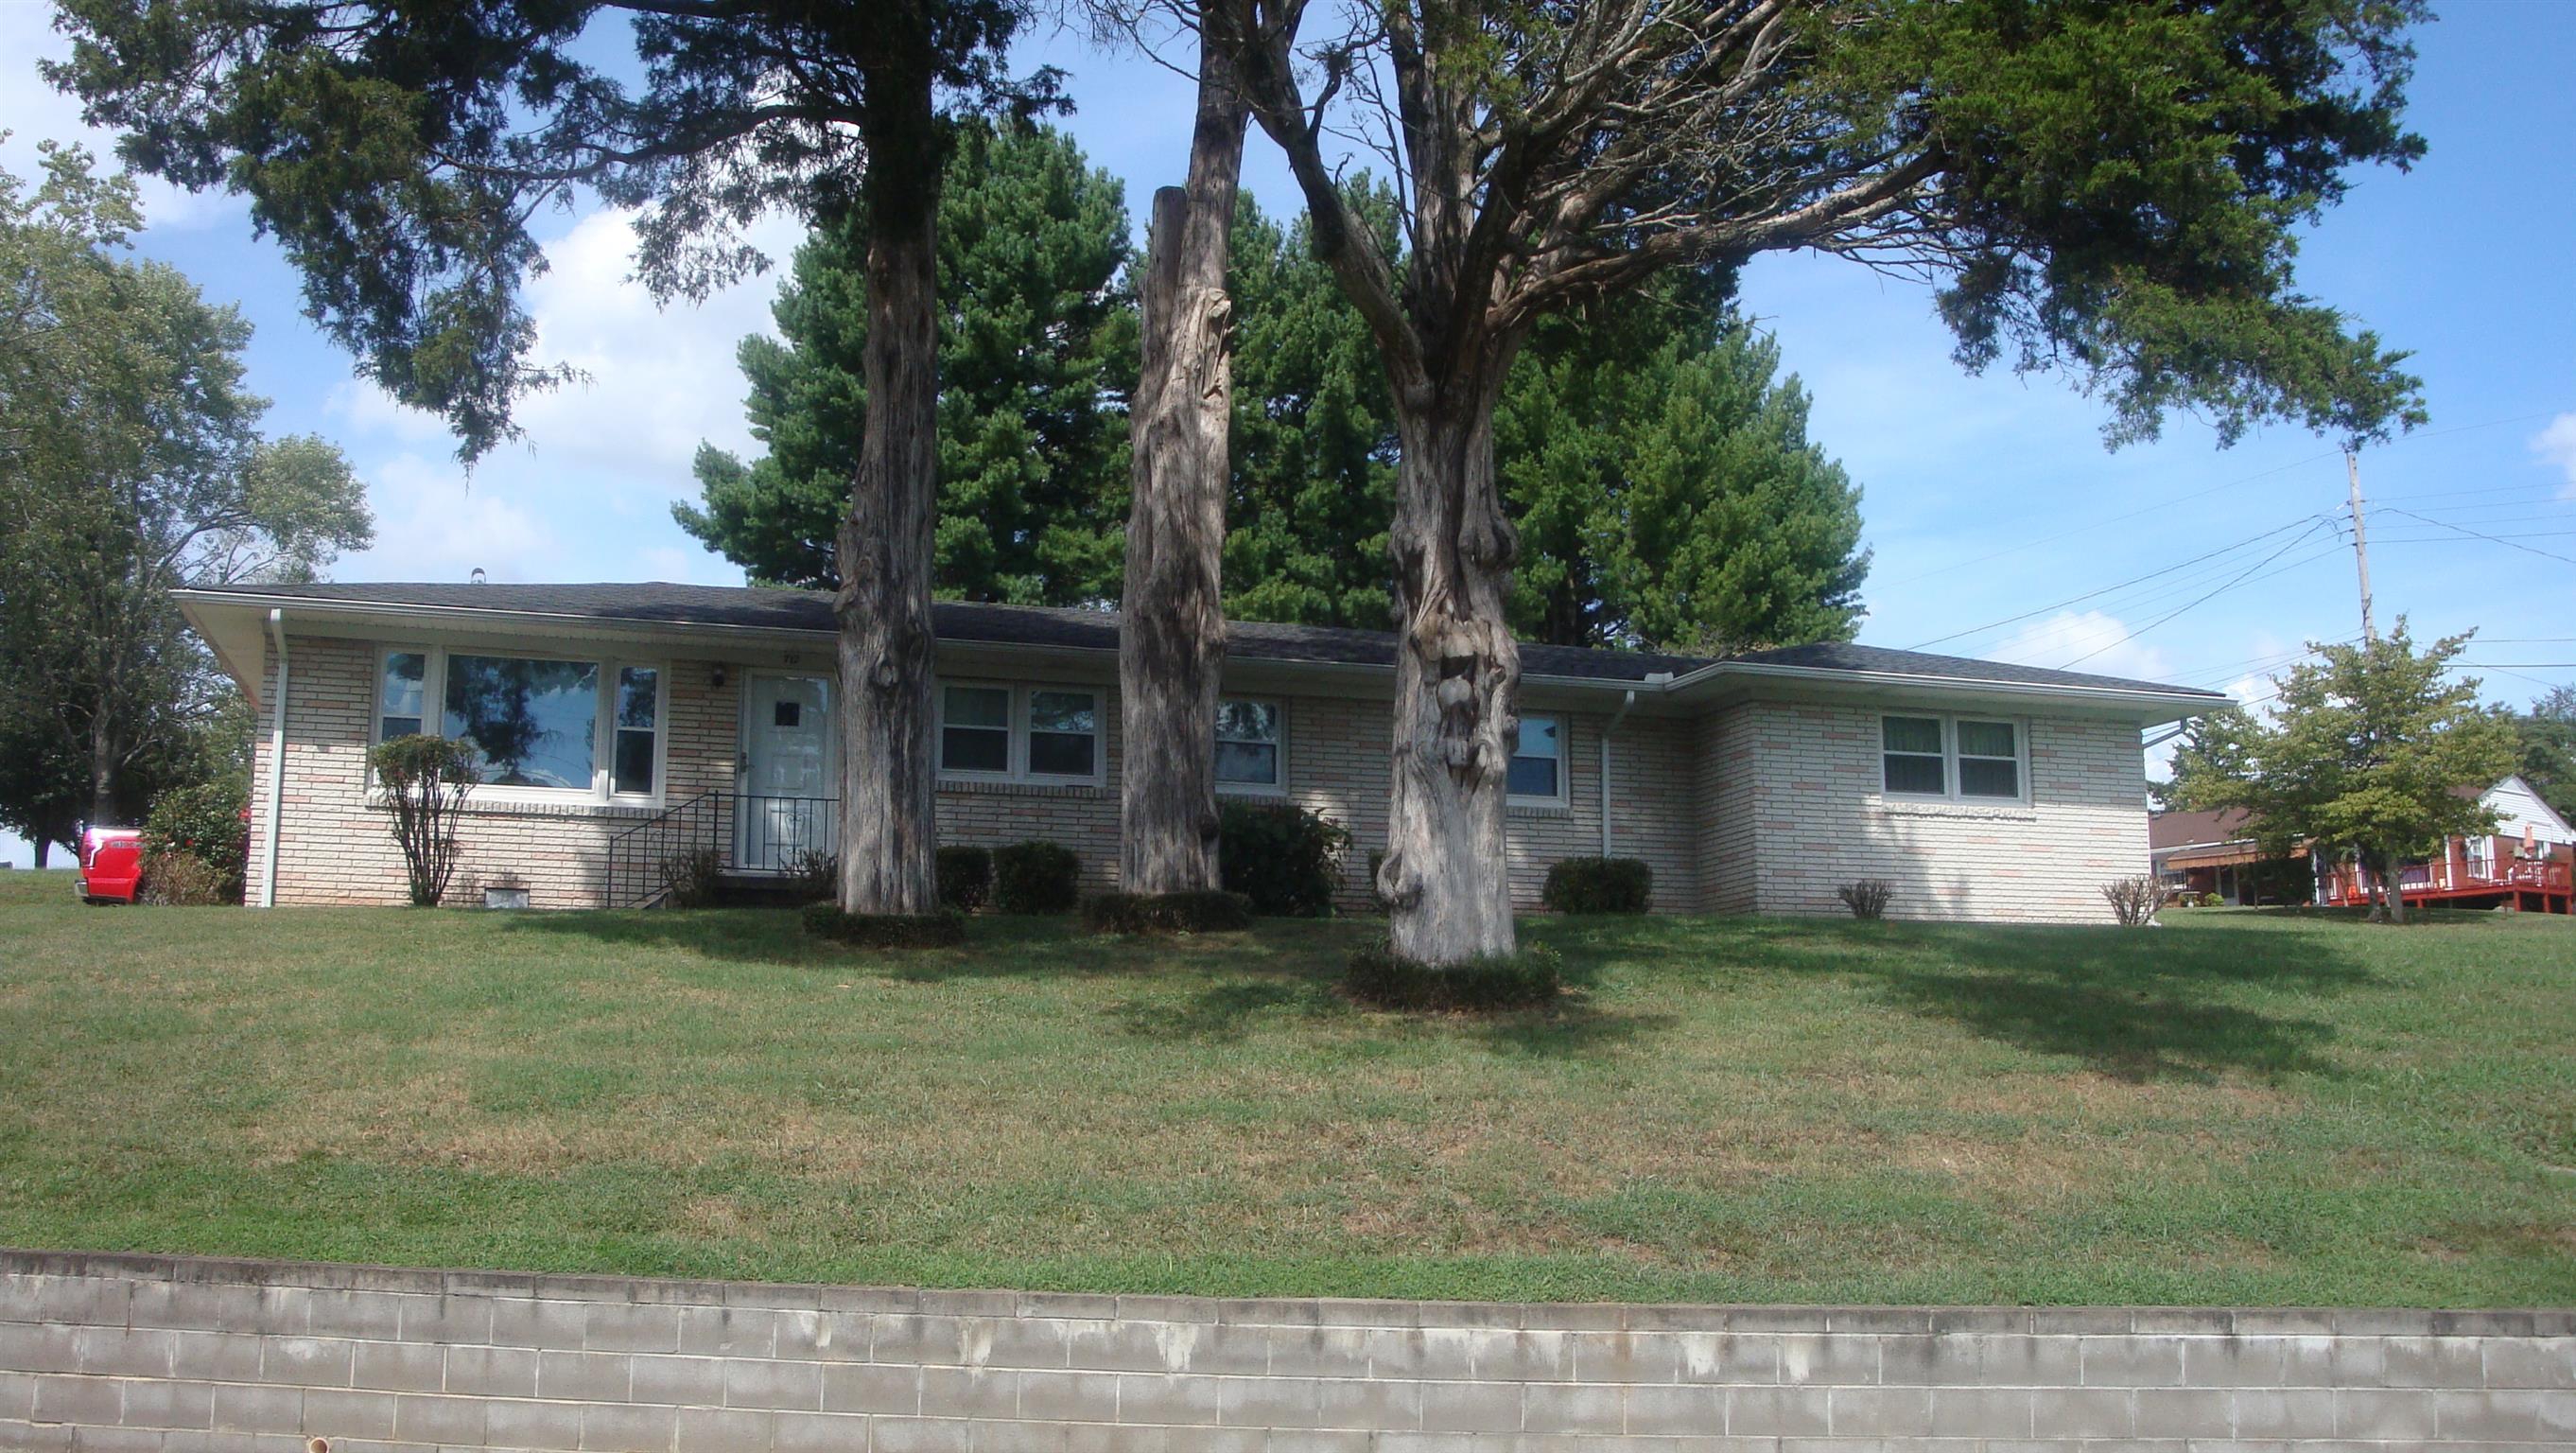 712 Meadow St, Lawrenceburg, TN 38464